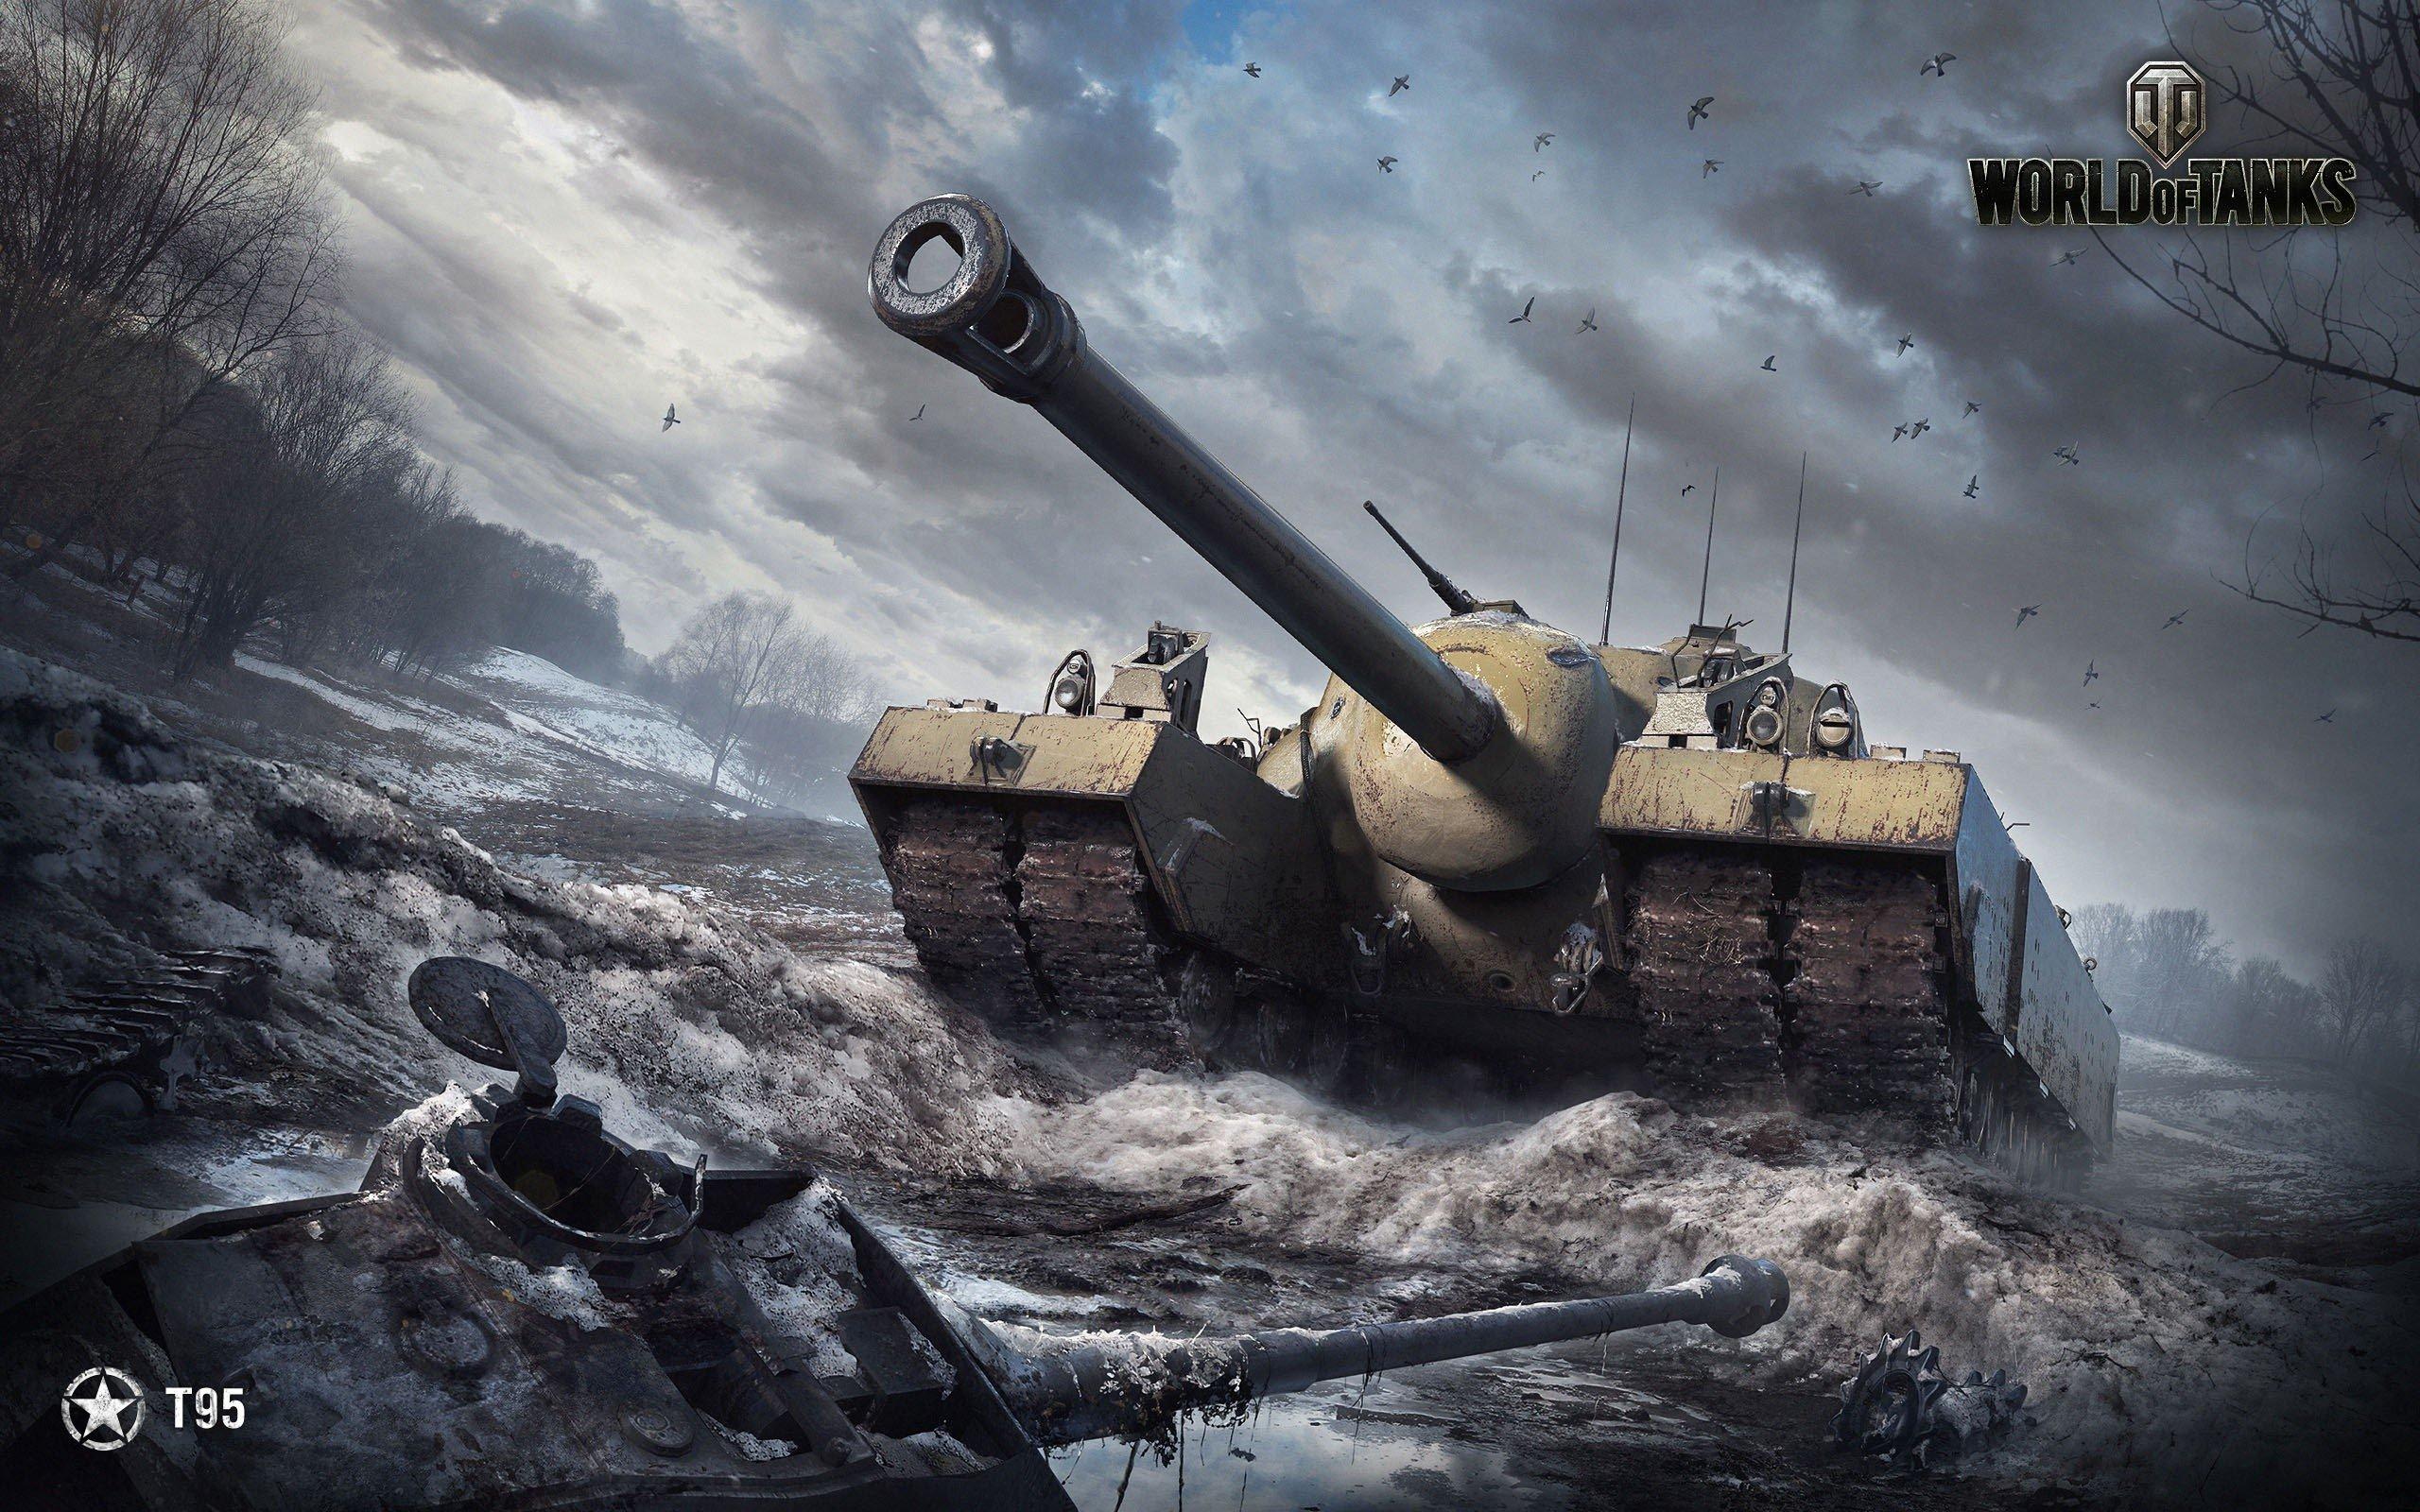 Fondos de pantalla T95 World Of Tanks